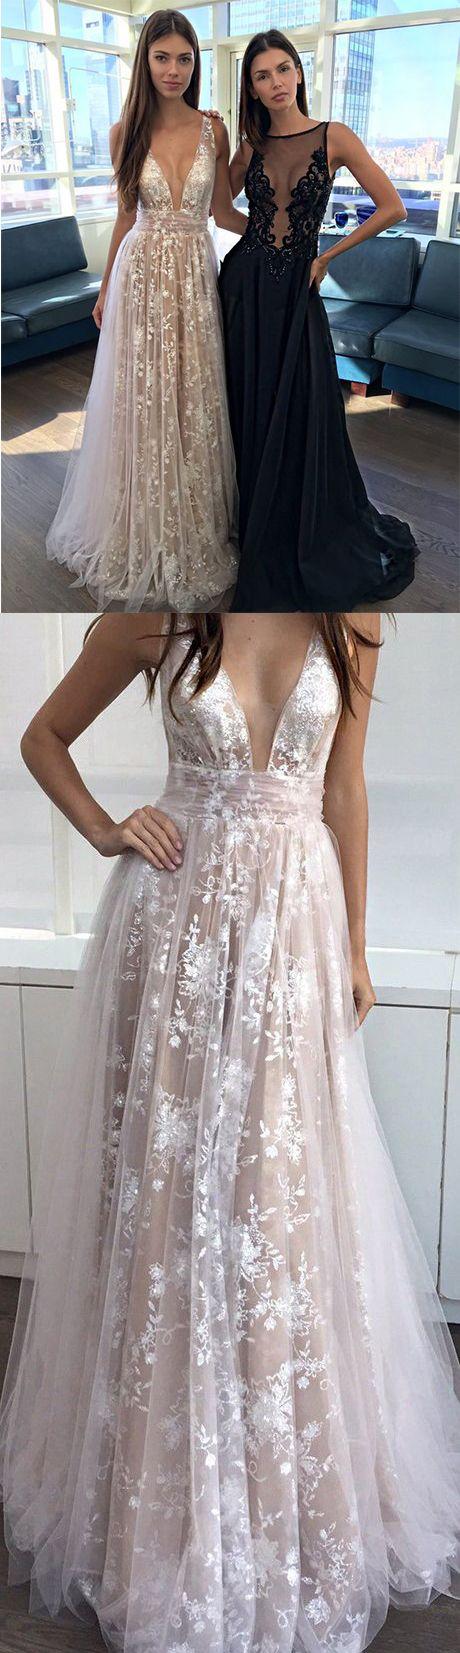 Champagne Prom Dresses,A Line Prom Dresses,V-neck Evening Dresses,Sexy Party Dresses, Long Formal Dress,Prom Dress